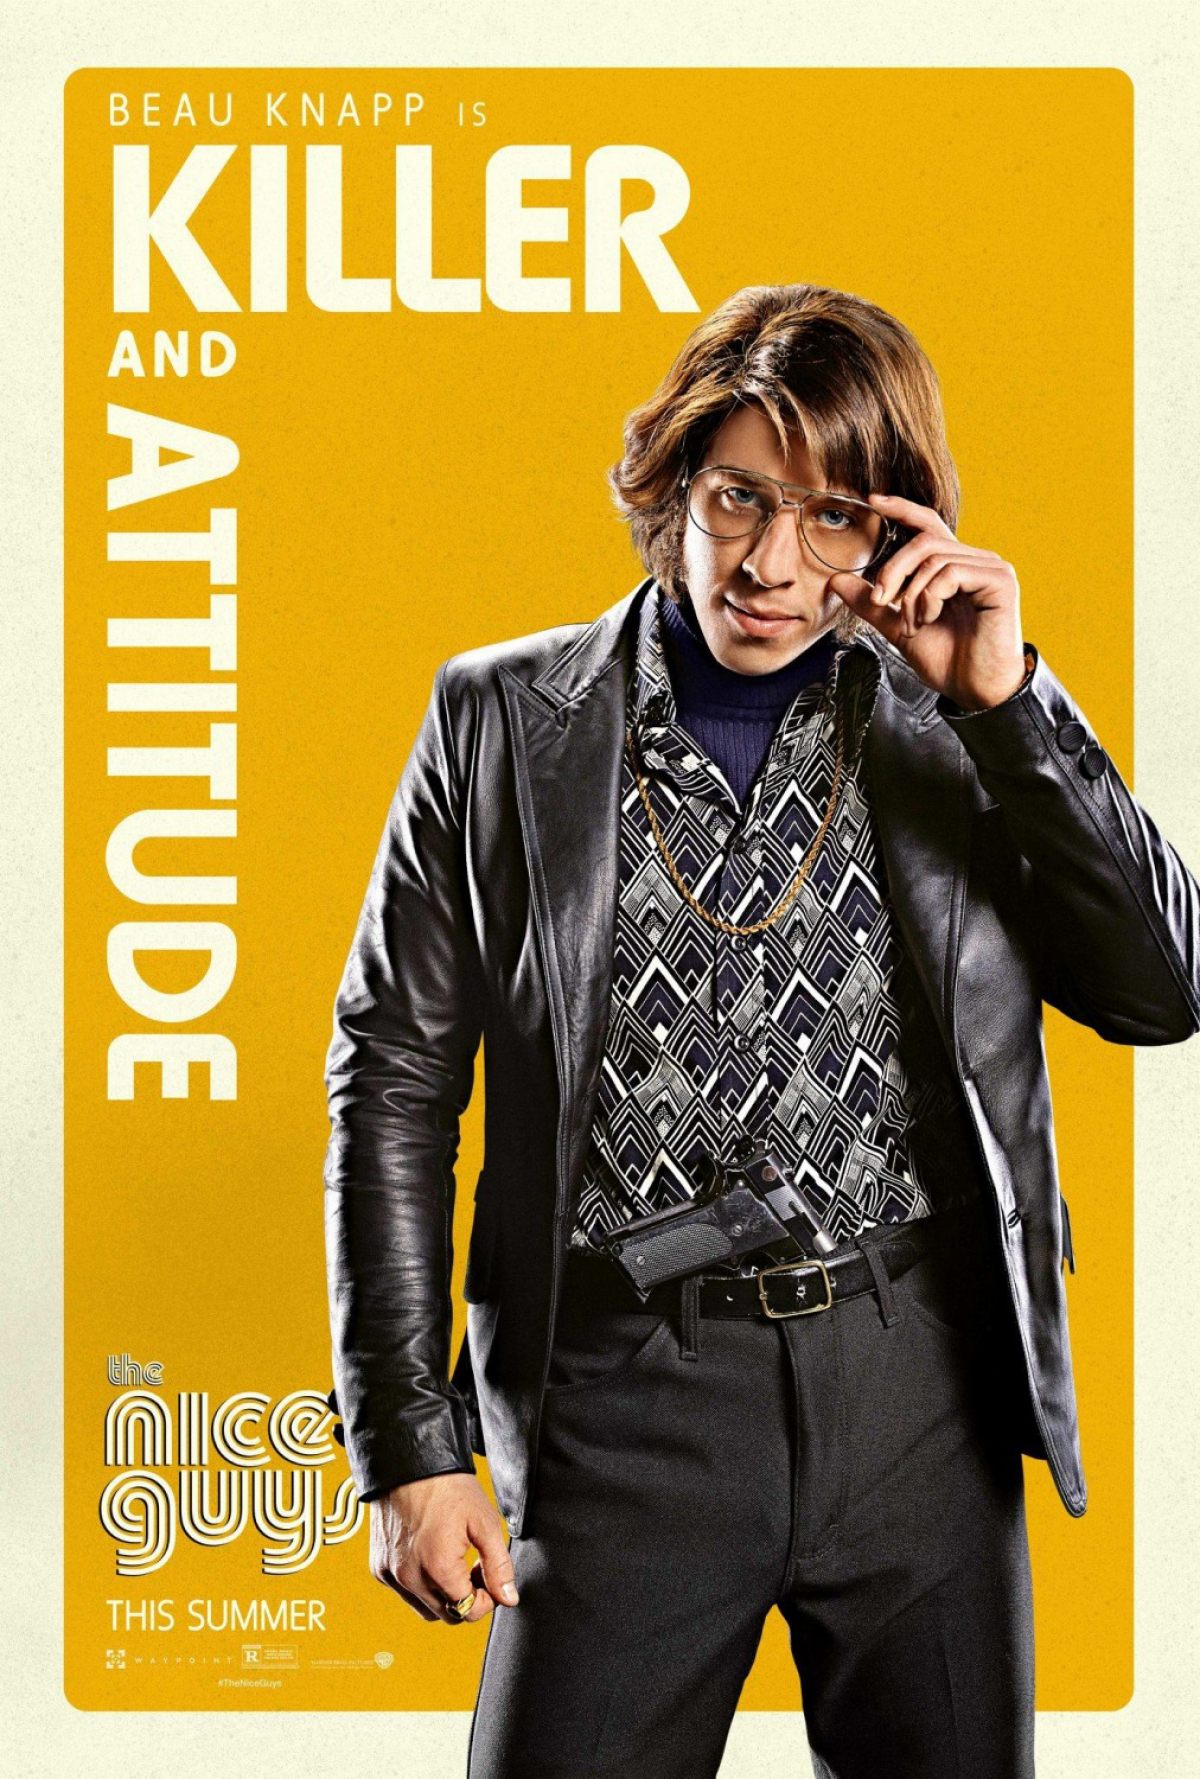 beau-knapp-the-nice-guy-poster